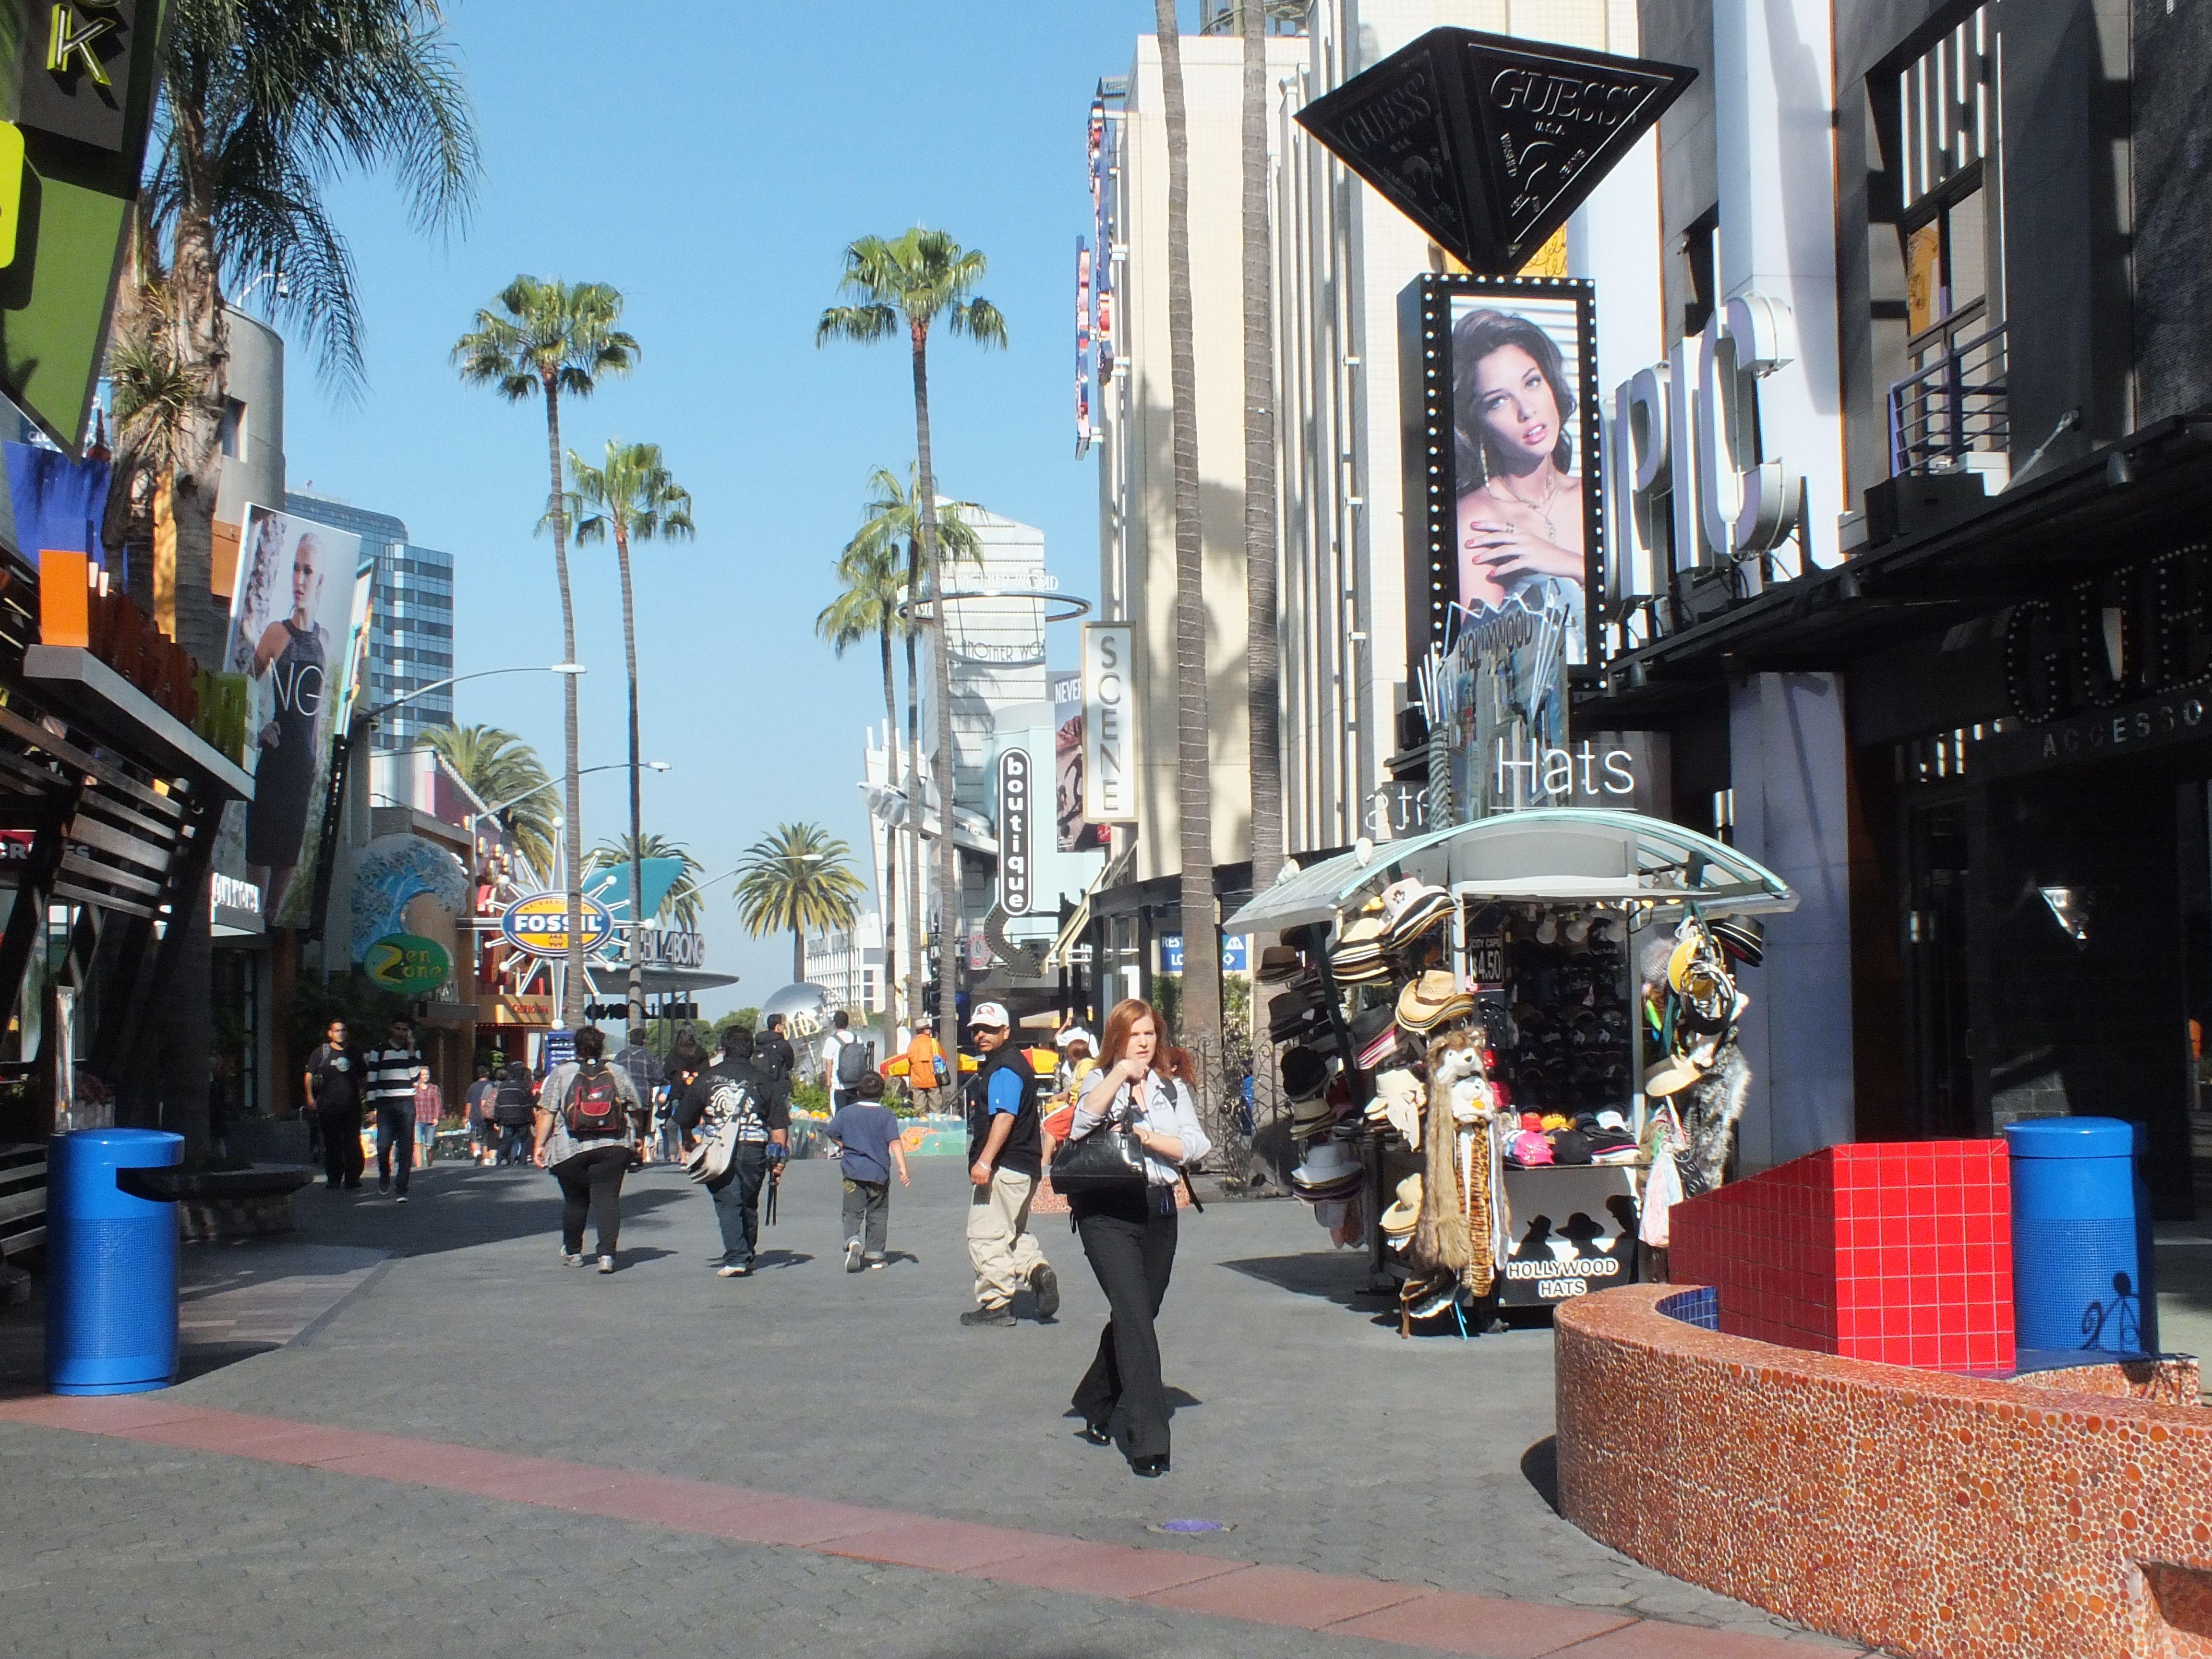 City Walk Universal Studios Hollywood Universal Studios Florida Street View